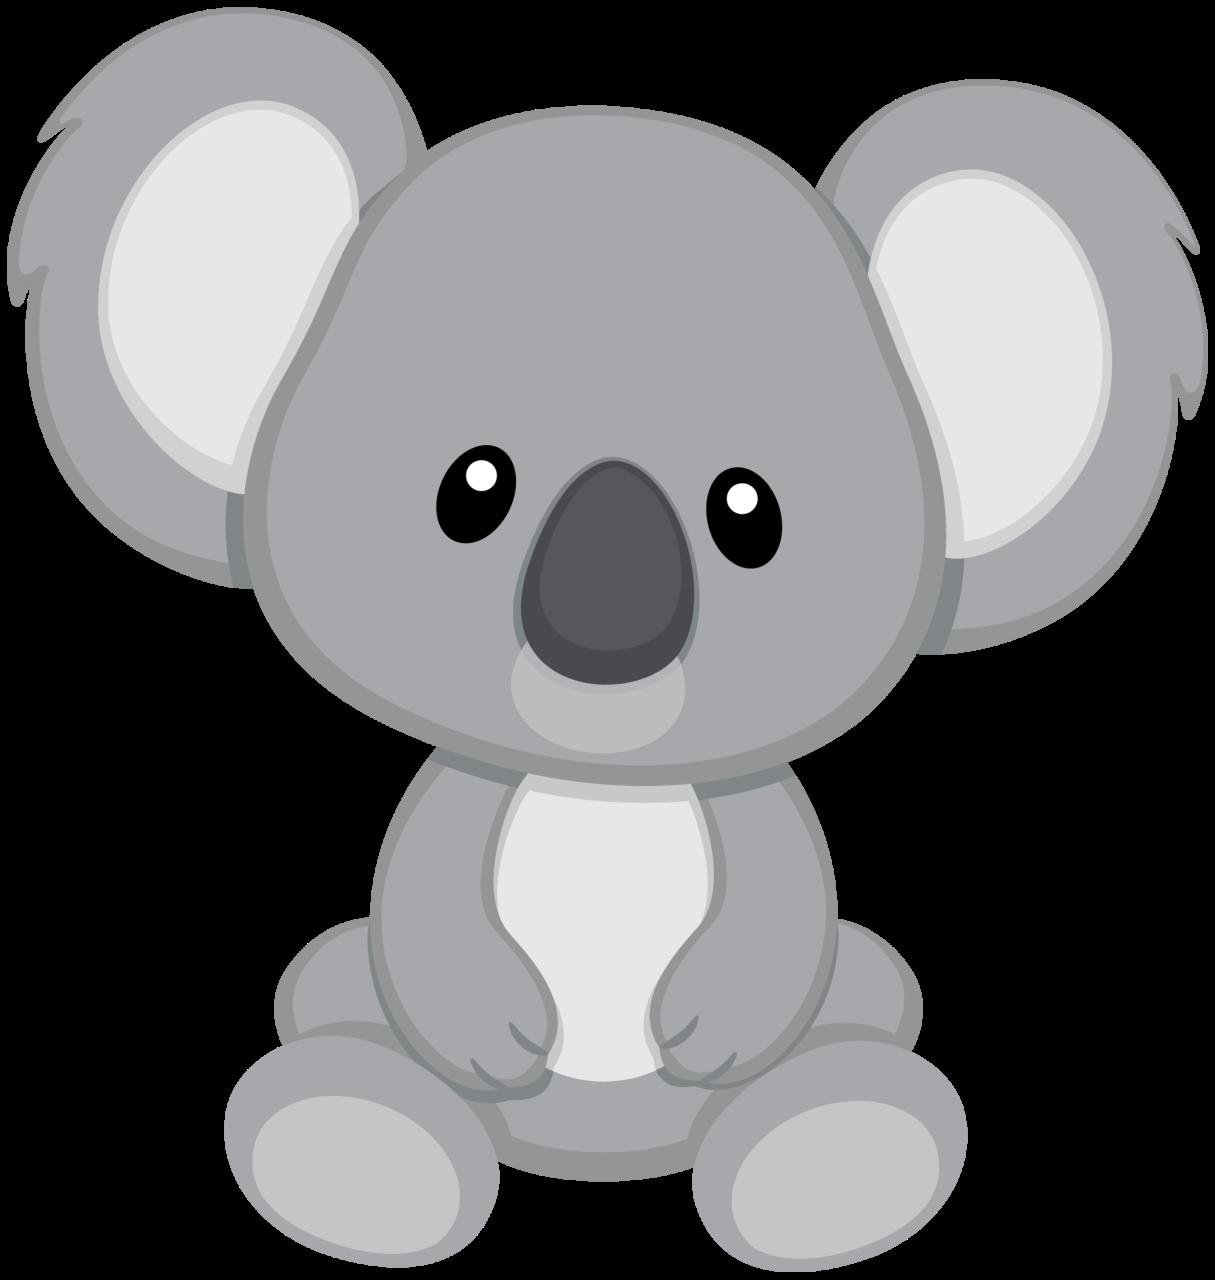 df dc orig. Clipart animals koala